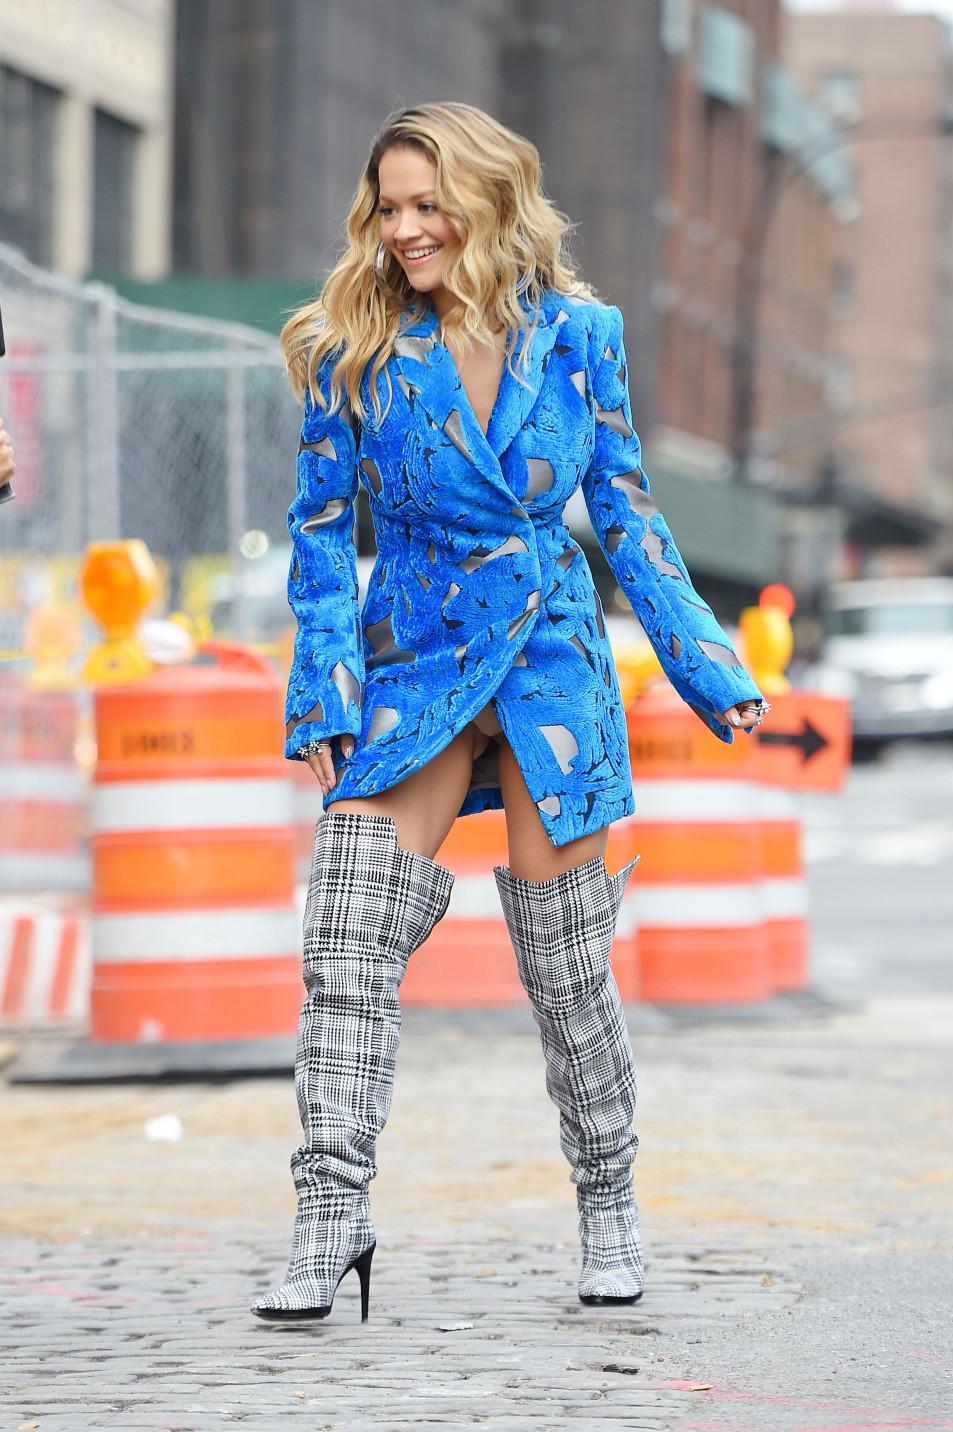 Rita-Ora---upskirt-during-her-video-shoot-in-NYC---10052017-6.jpg